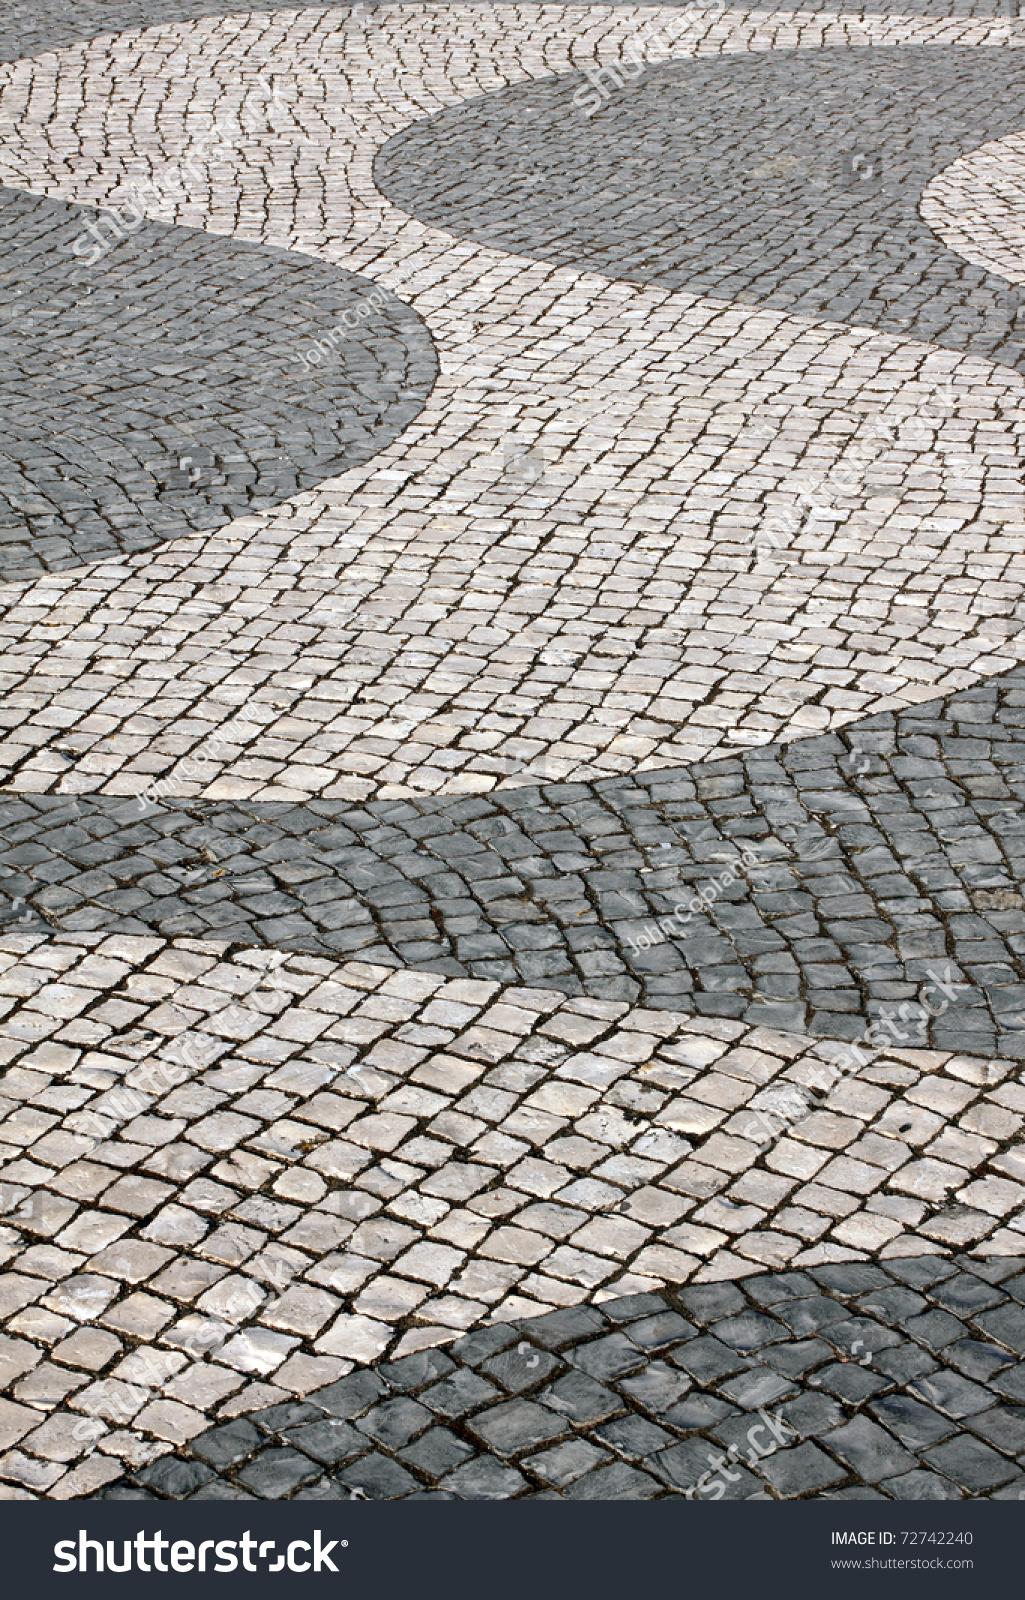 Cobble Stone Mosaics : Portugal lisbon typical portuguese calcada mosaic stock